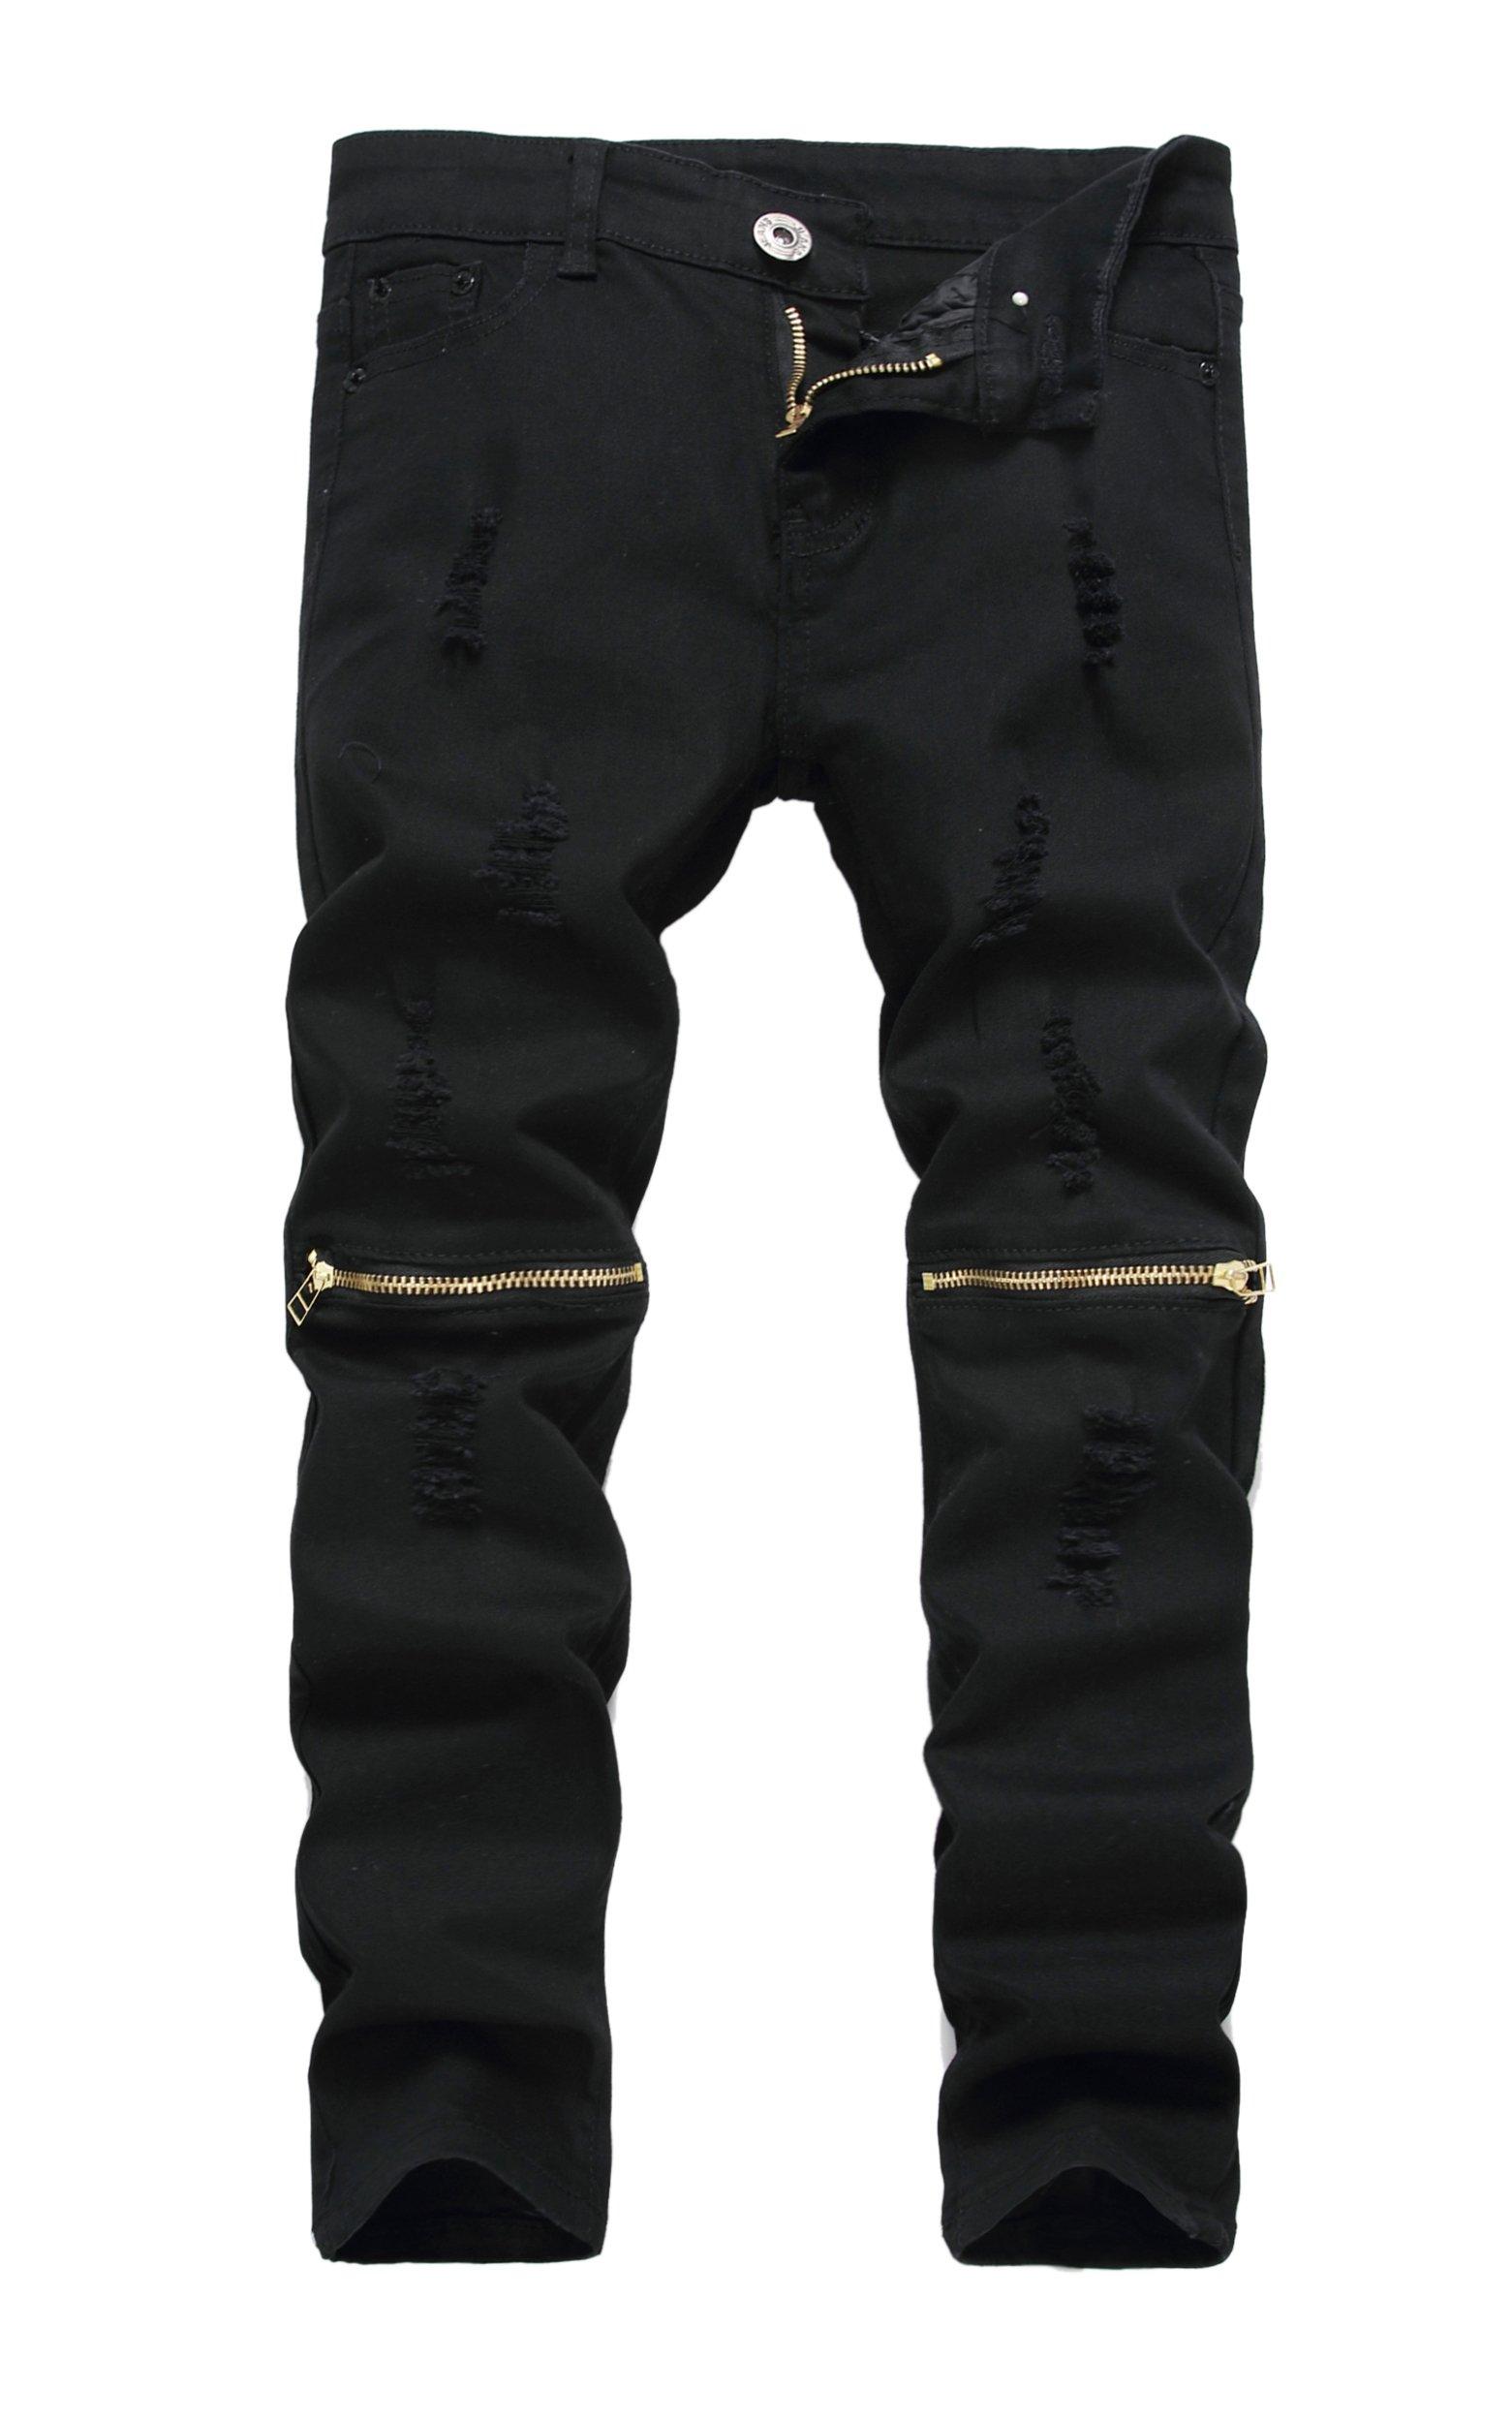 Boy's Black Slim Fit Skinny Jeans Ripped Elastic Waist Pants with Zipper for Kids,Black,10 Slim